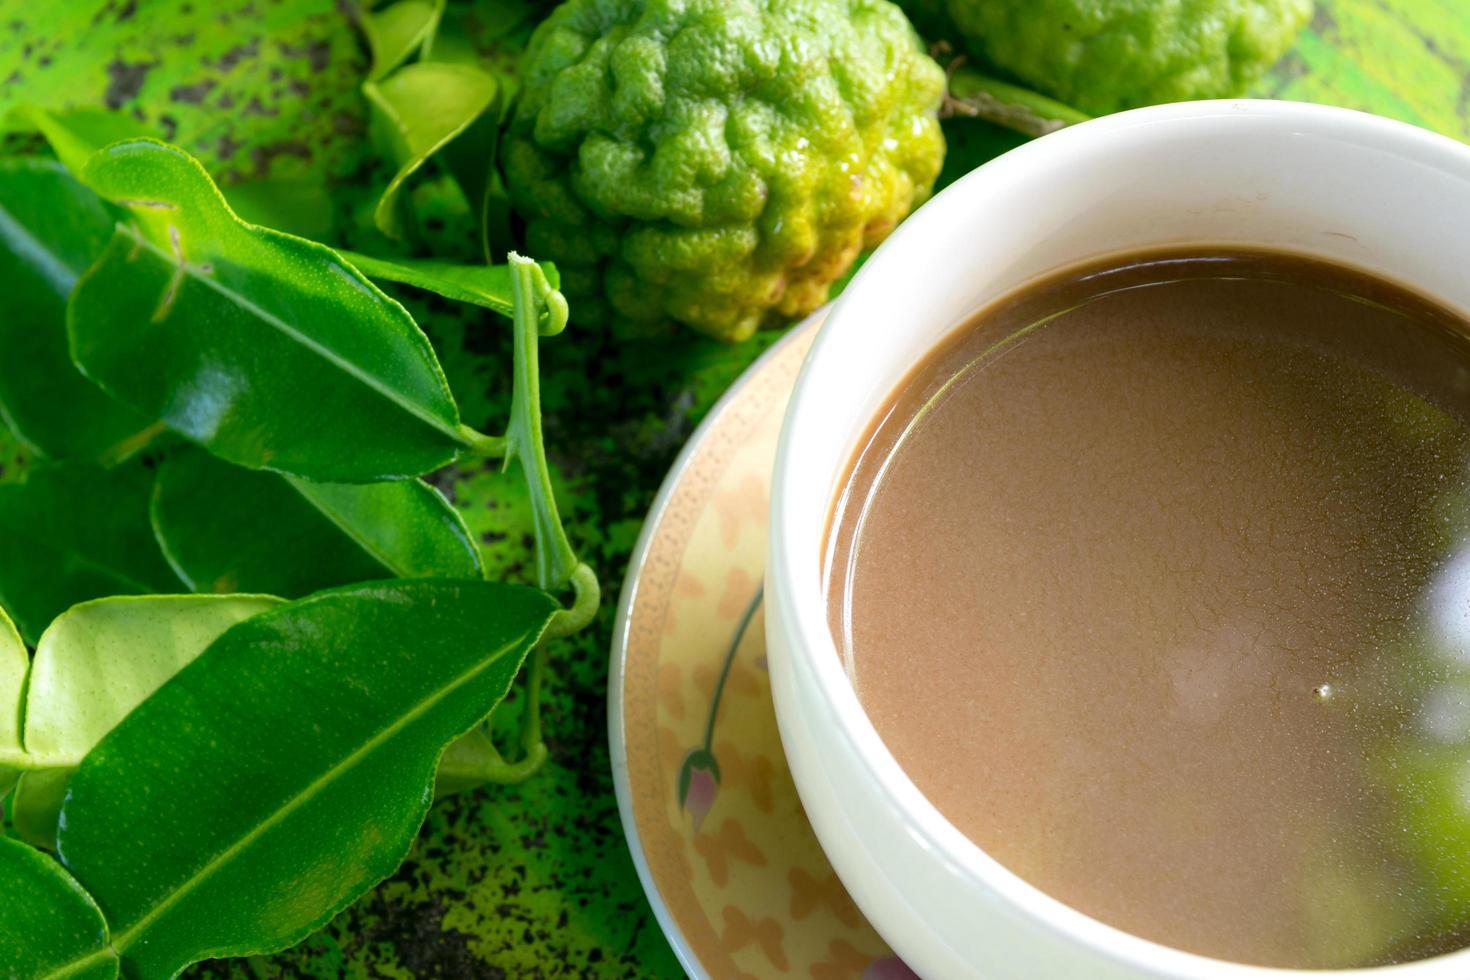 hojas de lima kaffir y café foto